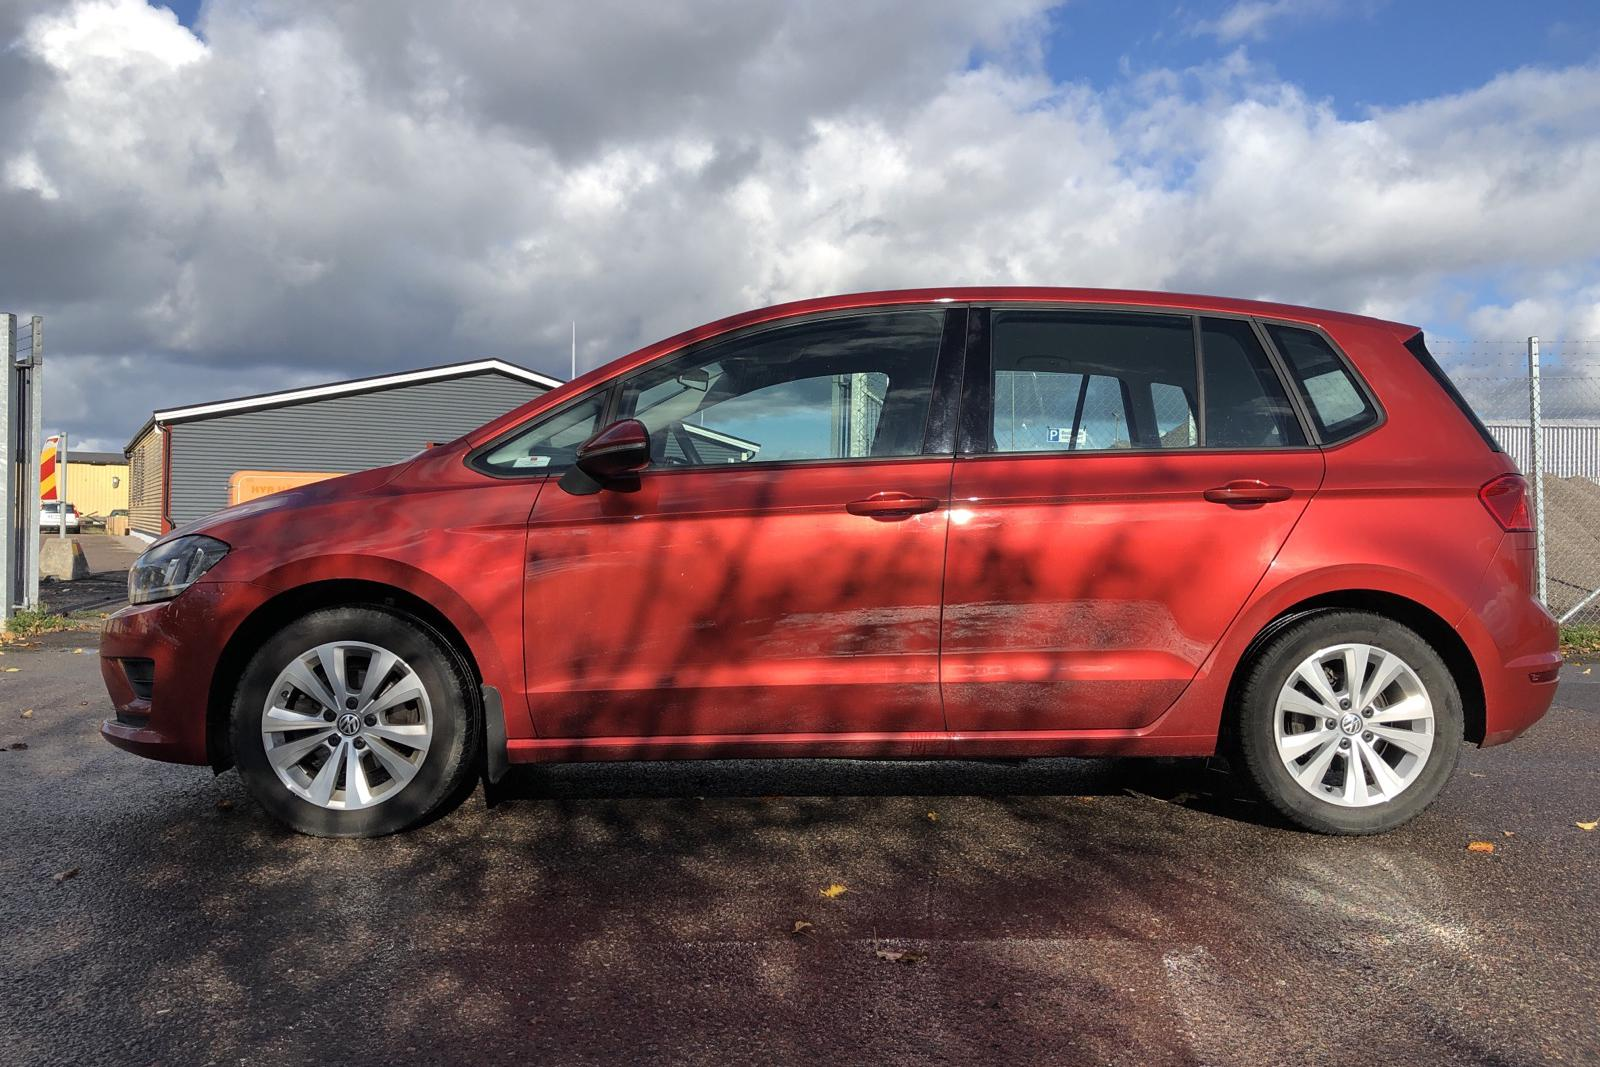 VW Golf VII 1.2 TSI BlueMotion Technology Sportsvan (110hk) - 85 910 km - Automatic - red - 2016